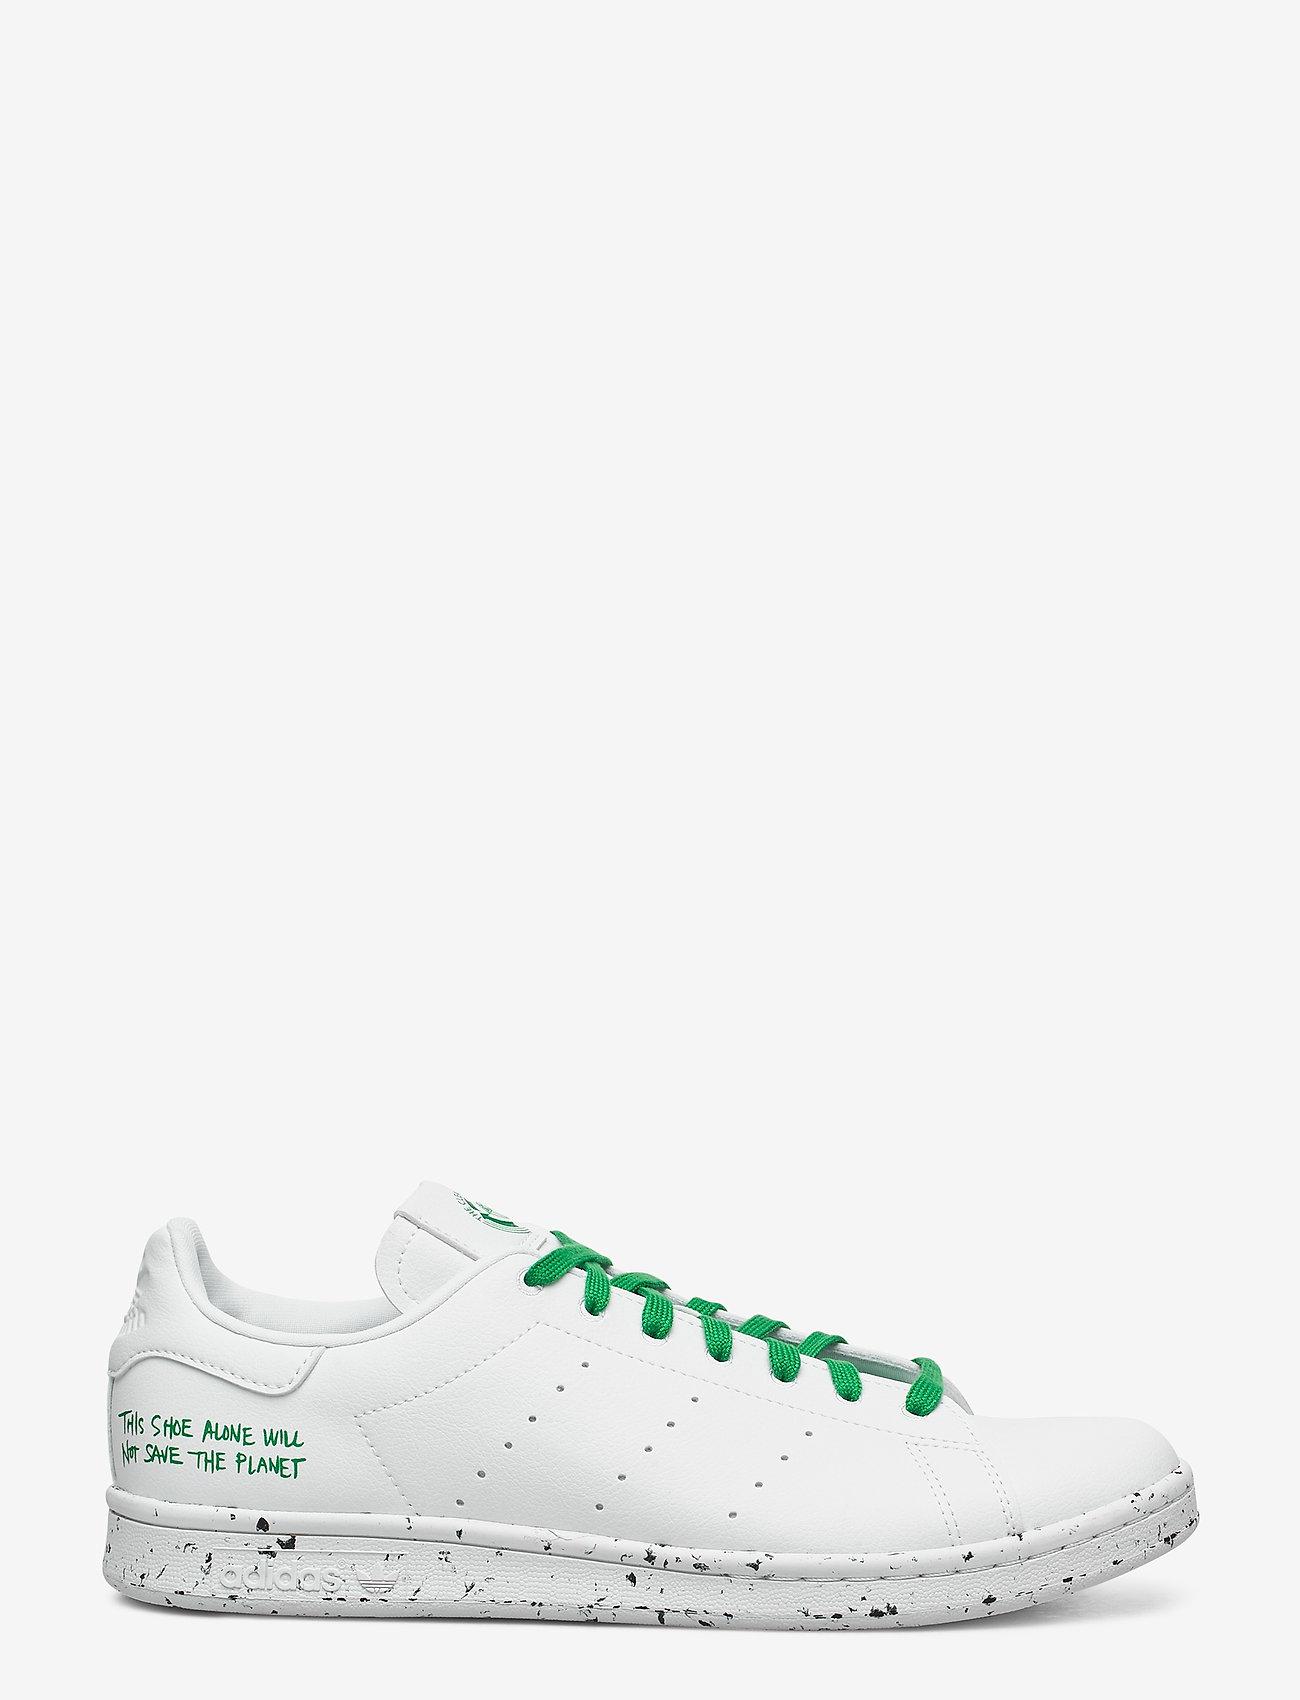 adidas Originals - STAN SMITH - lav ankel - ftwwht/ftwwht/green - 1